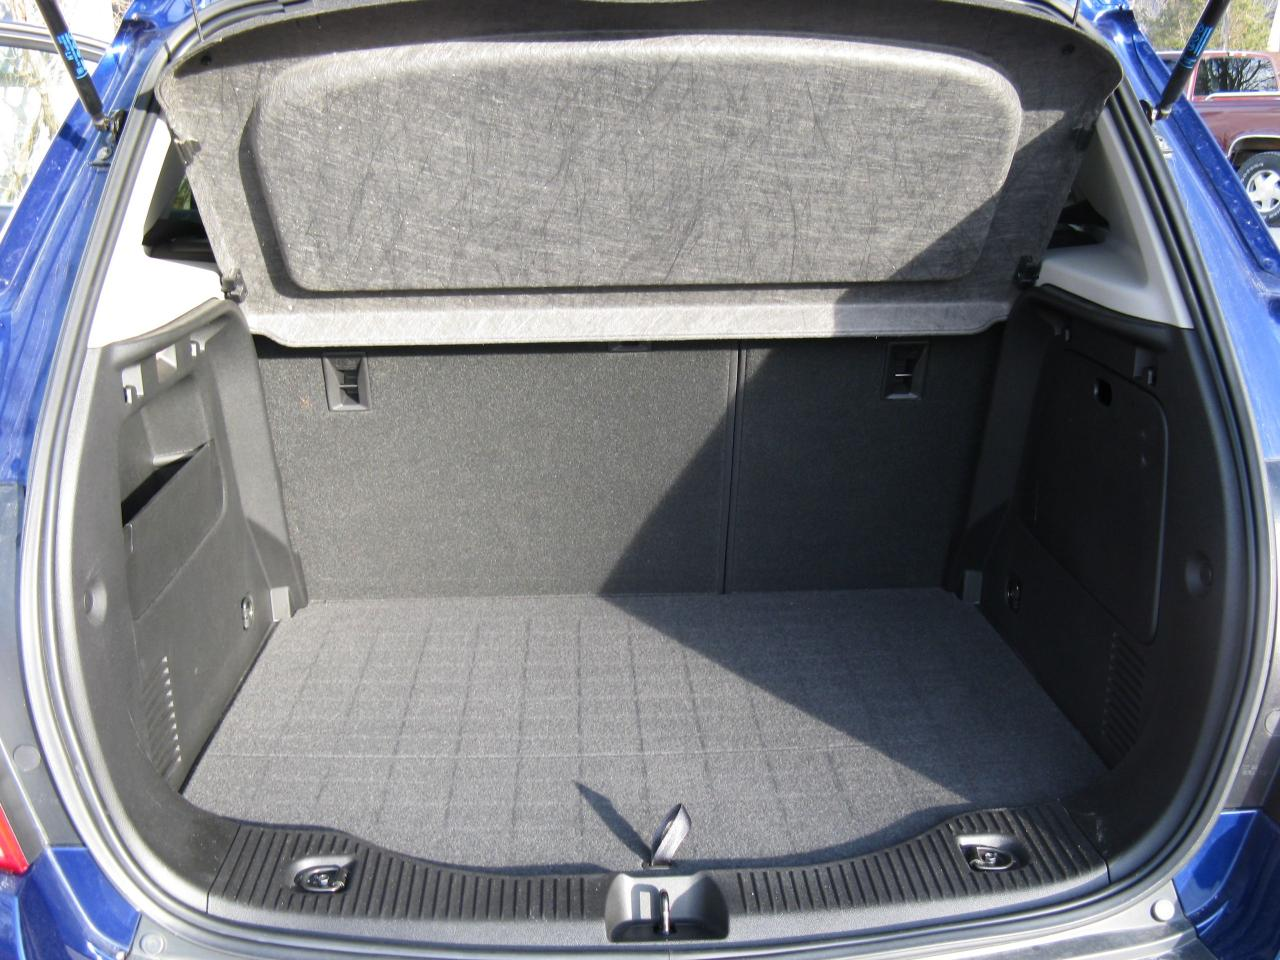 2016 Chevrolet Trax cloth